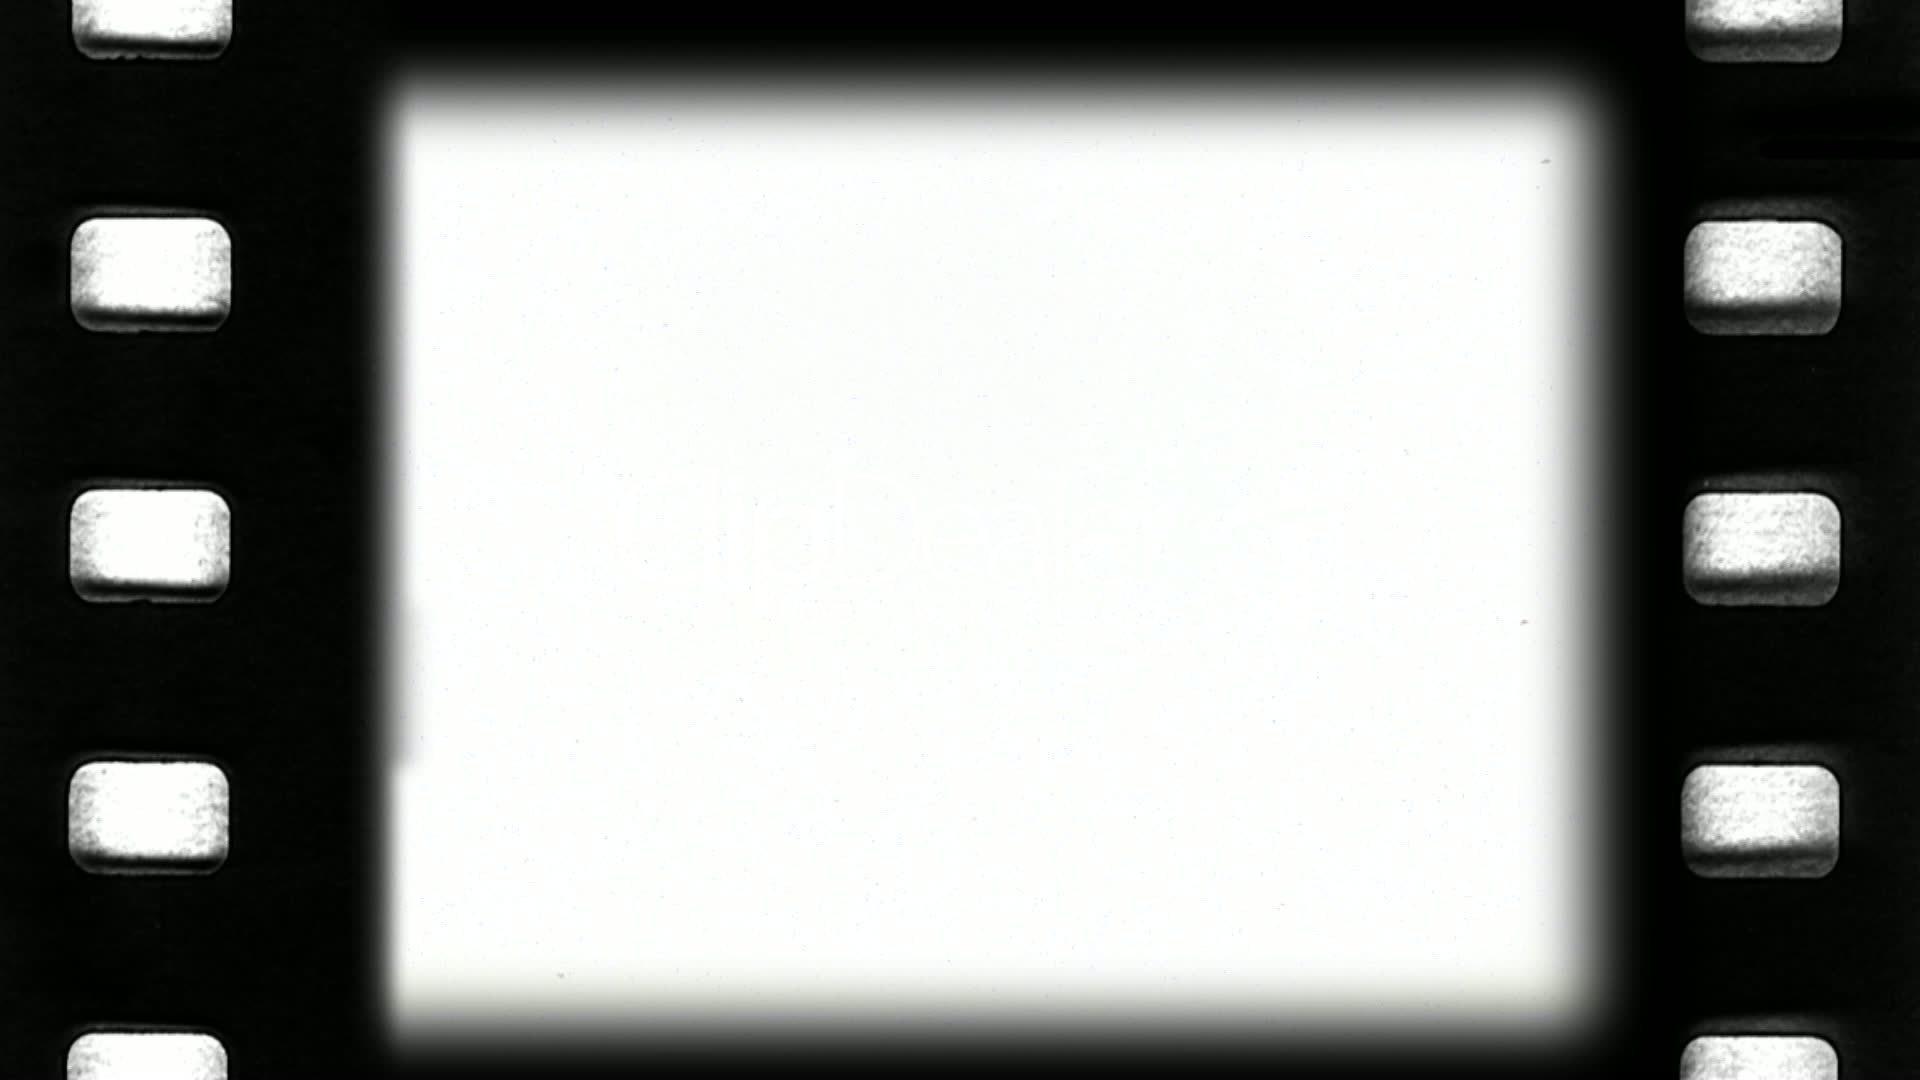 Index of filescompanies1476templatebg 1920x1080